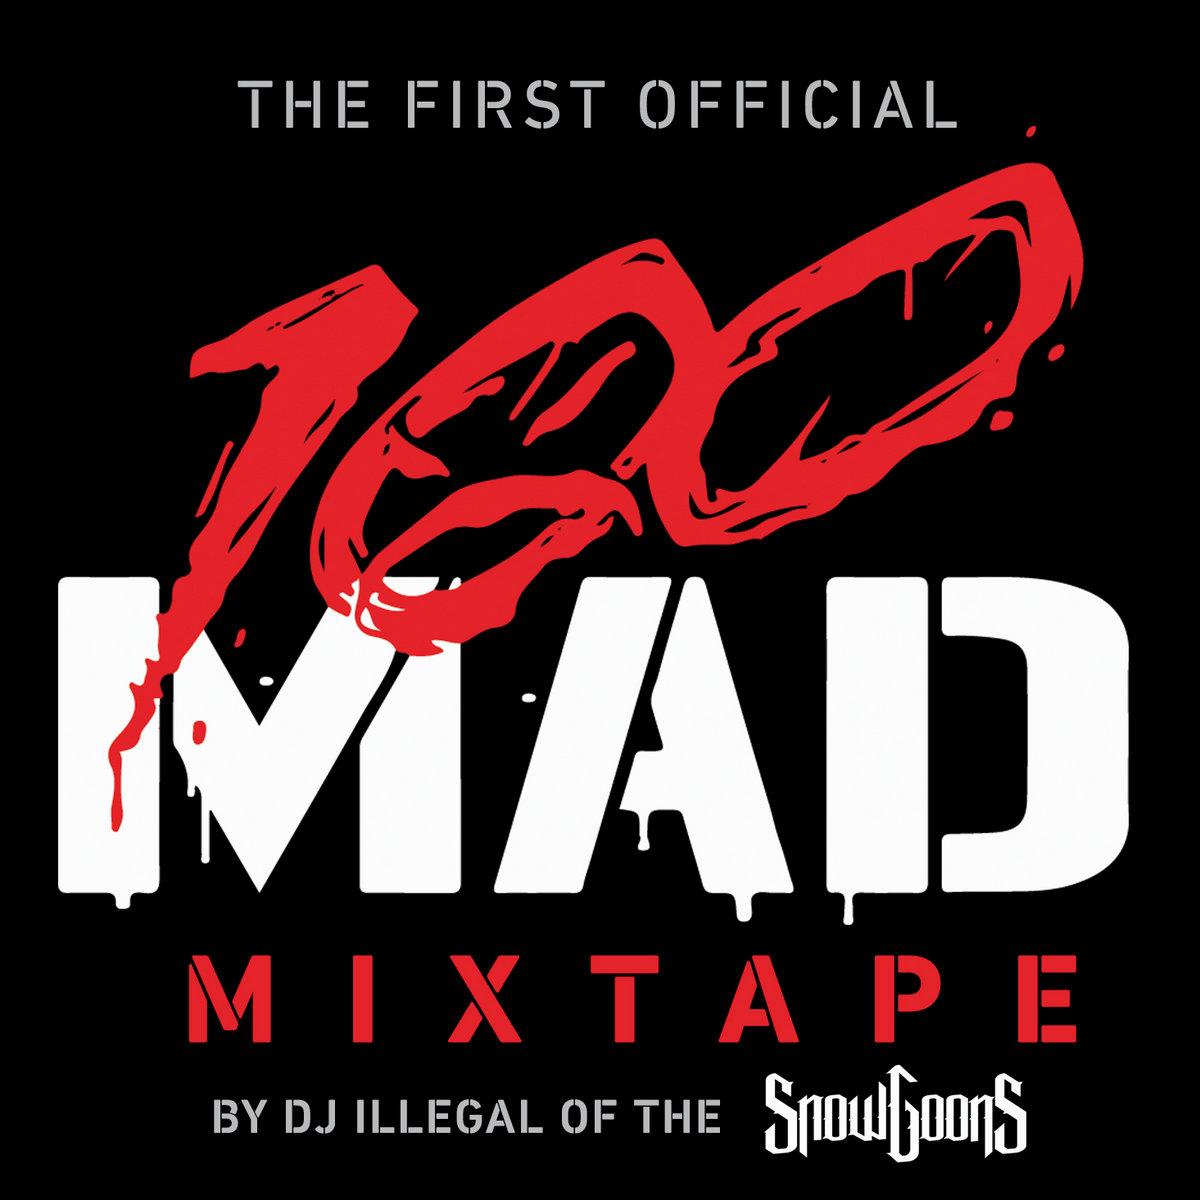 VA – 100 MAD Mixtape Volume One (2020) [FLAC]